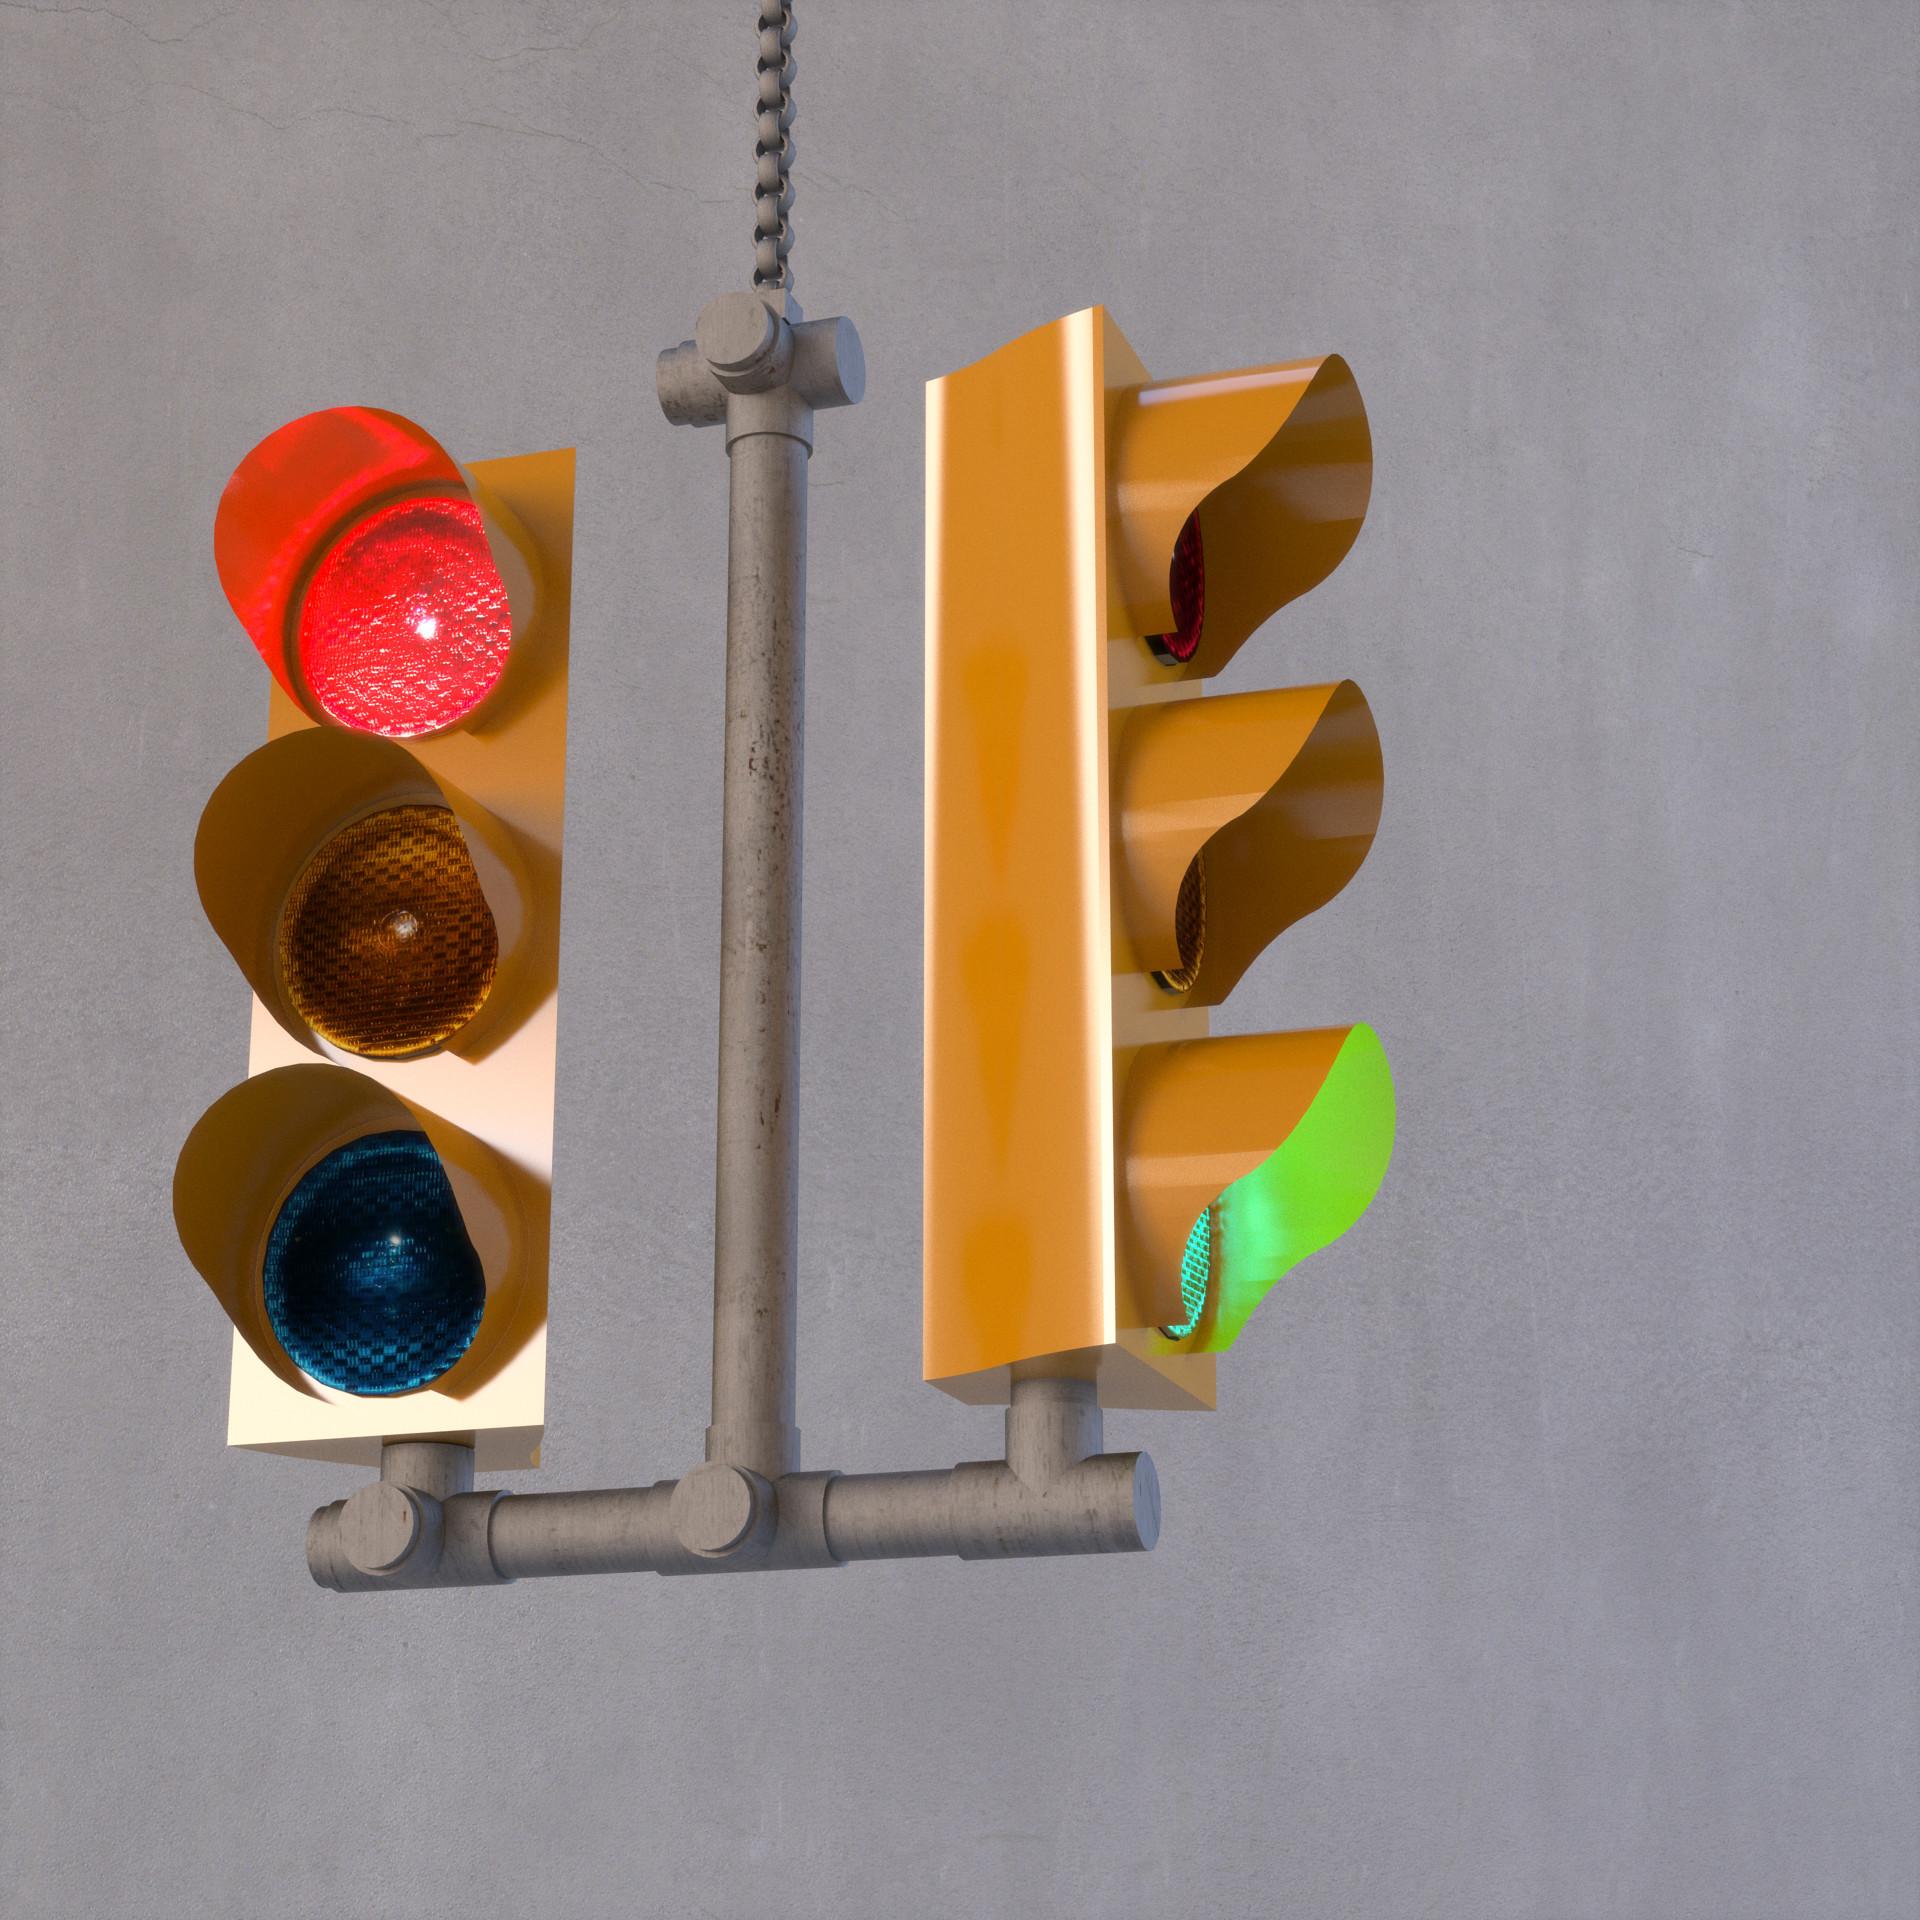 Duane kemp proposed kitchen signal light 04